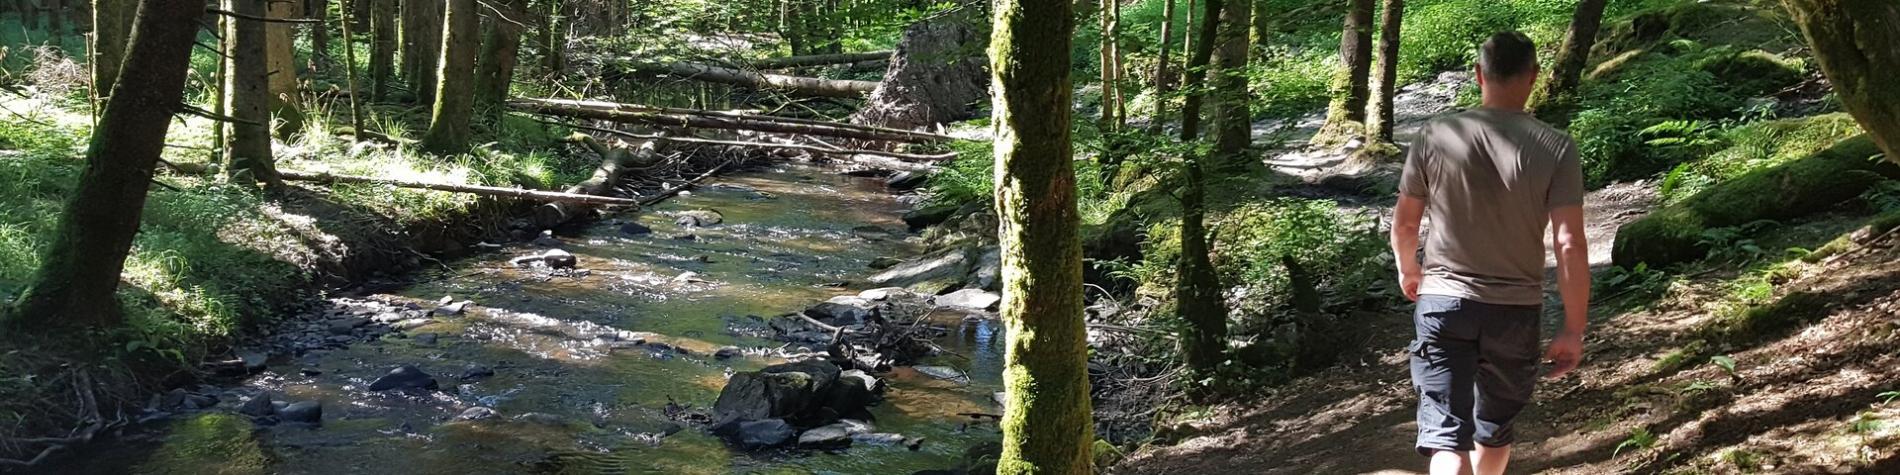 Achouffe - Vallée des Fées